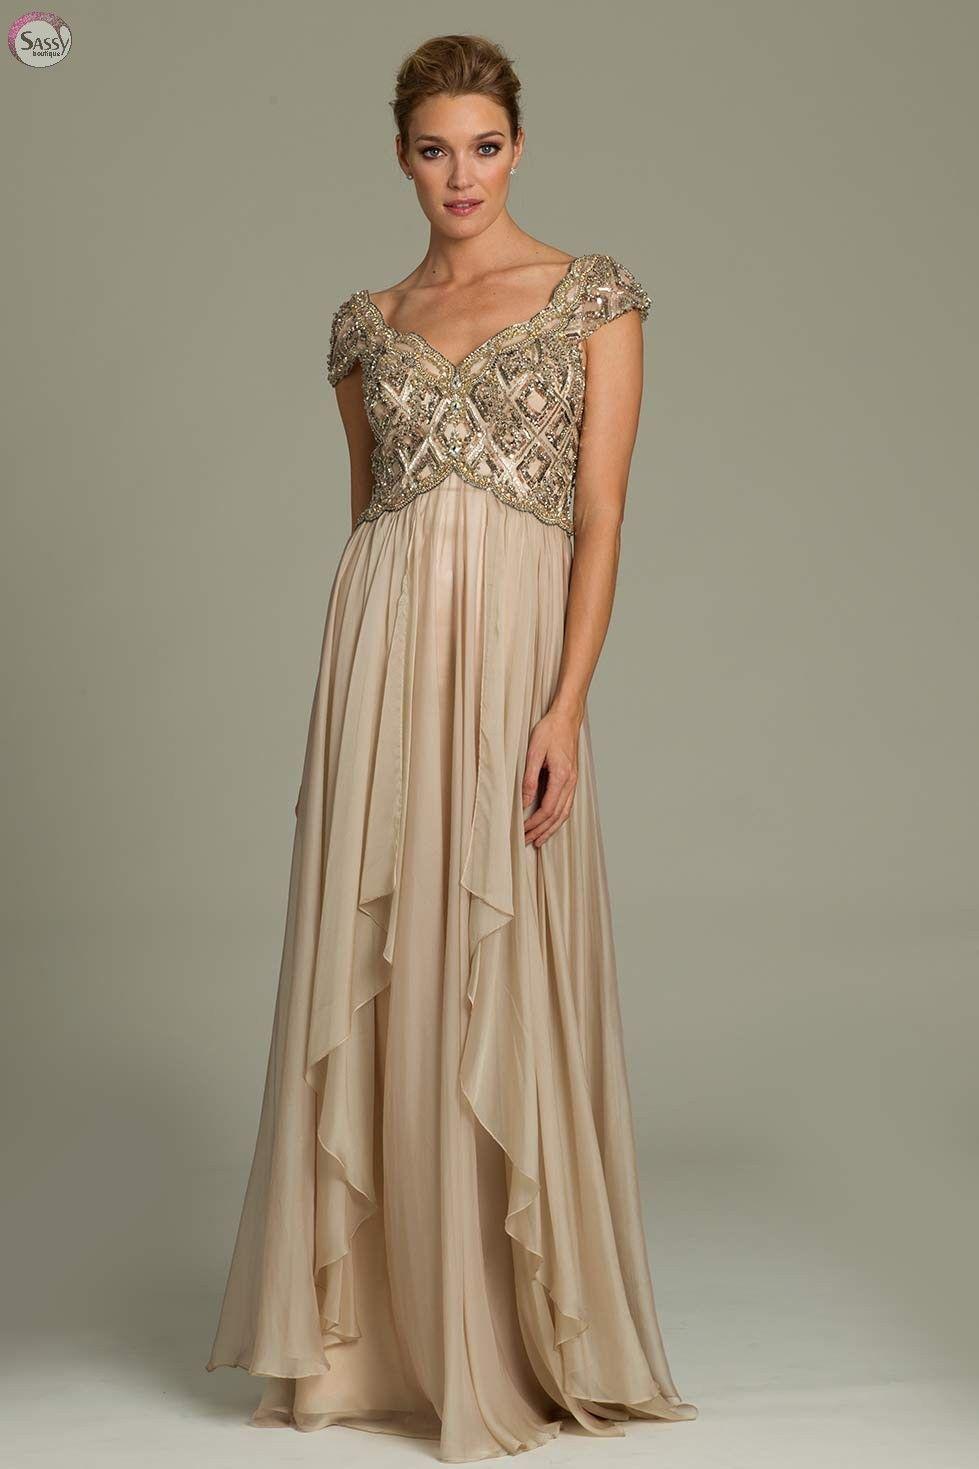 Style en dress 091880660 | Color dress | Pinterest | Die Braut, Stil ...